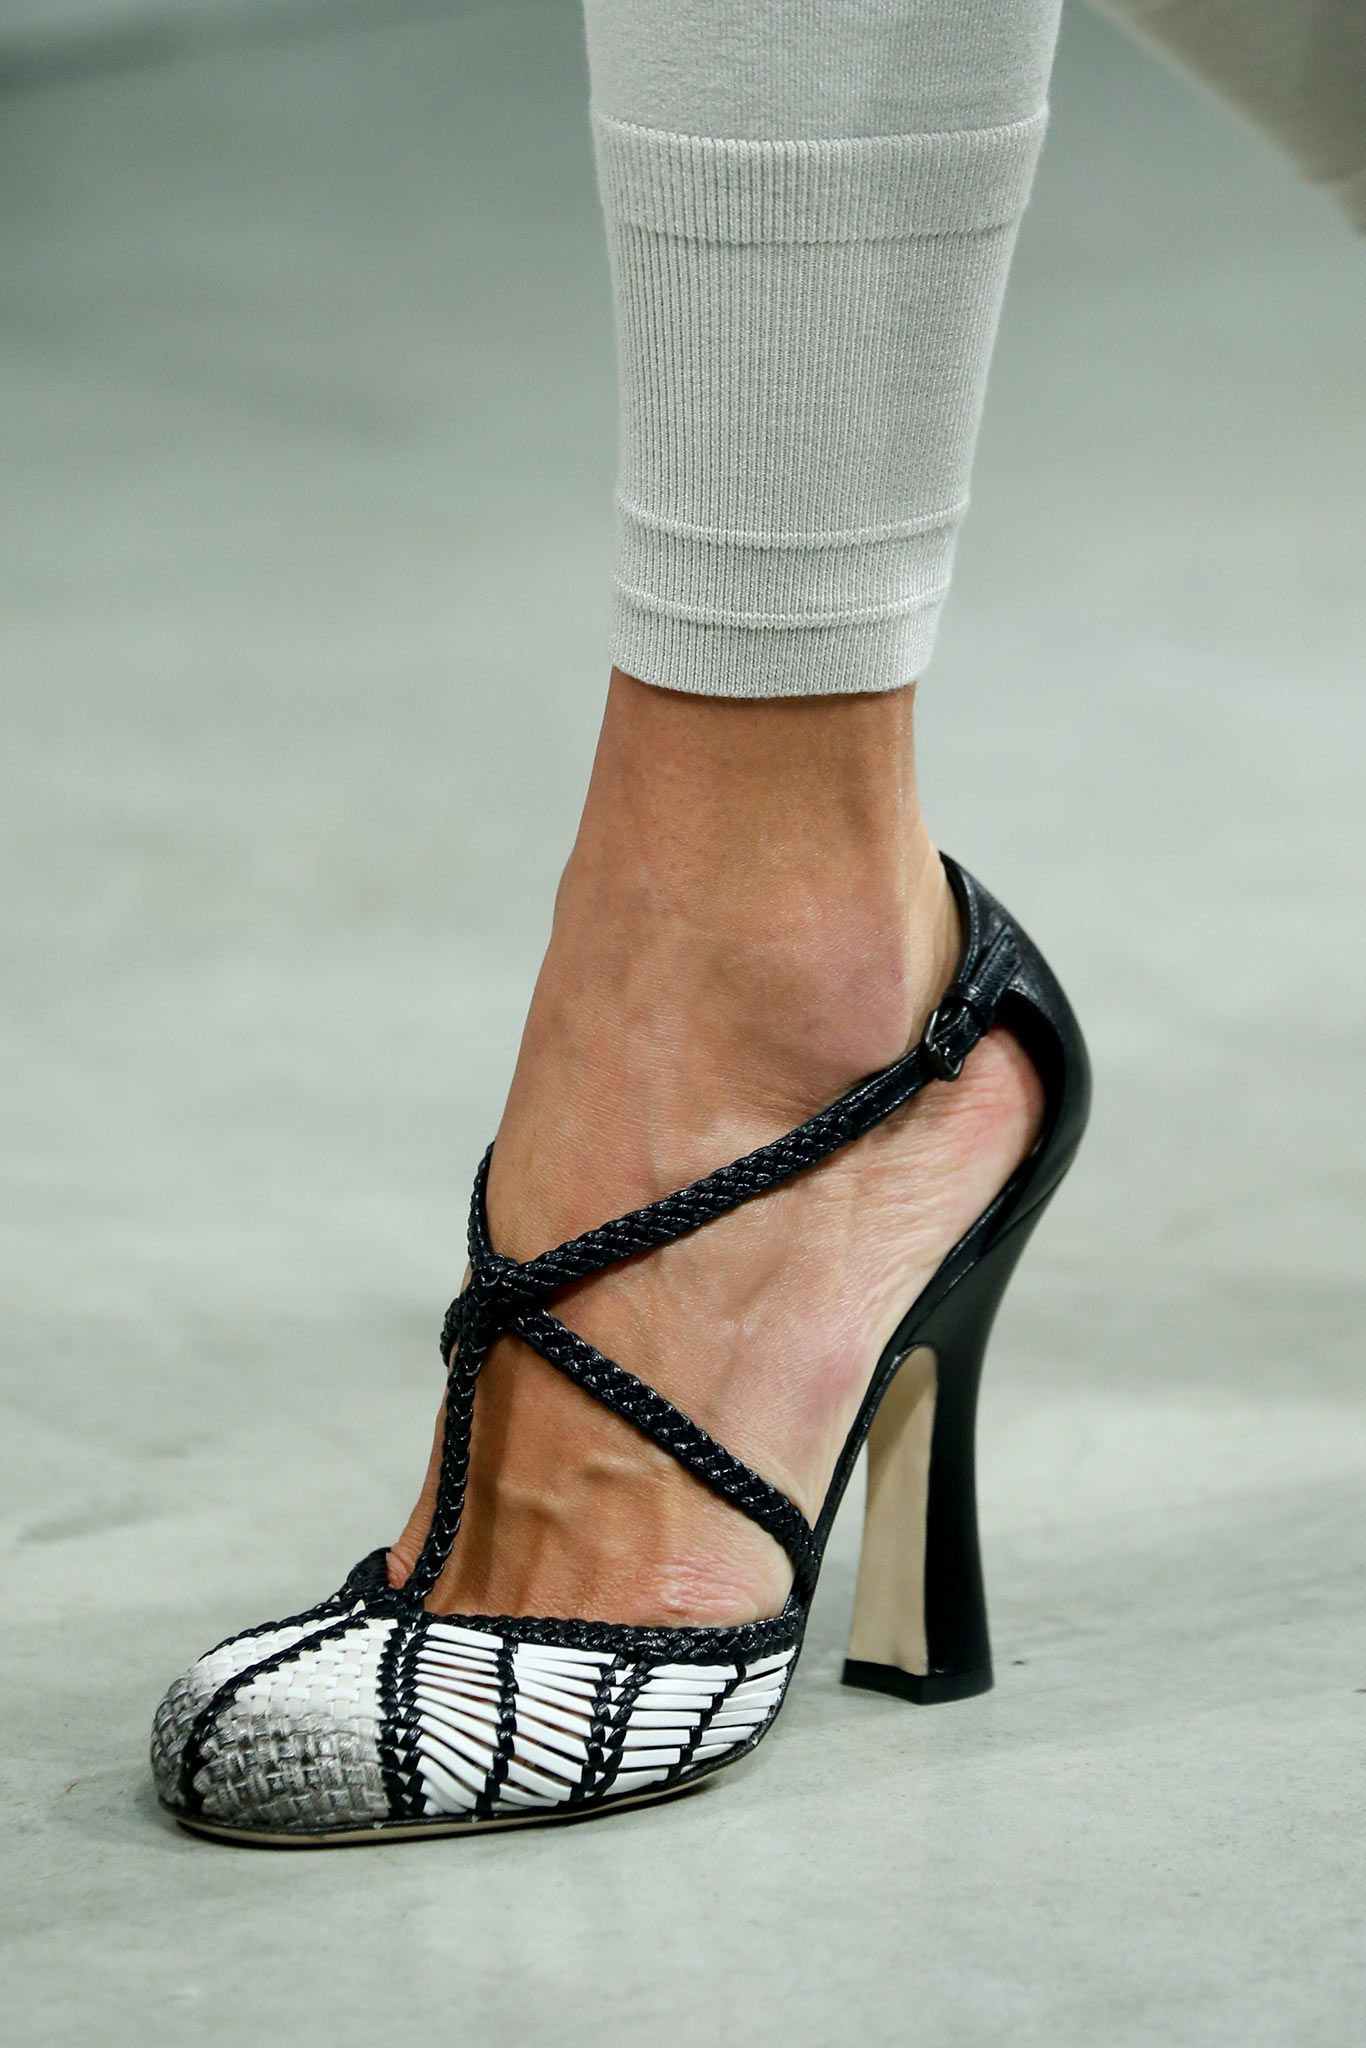 bottega veneta spring 2015 readytowear shoes